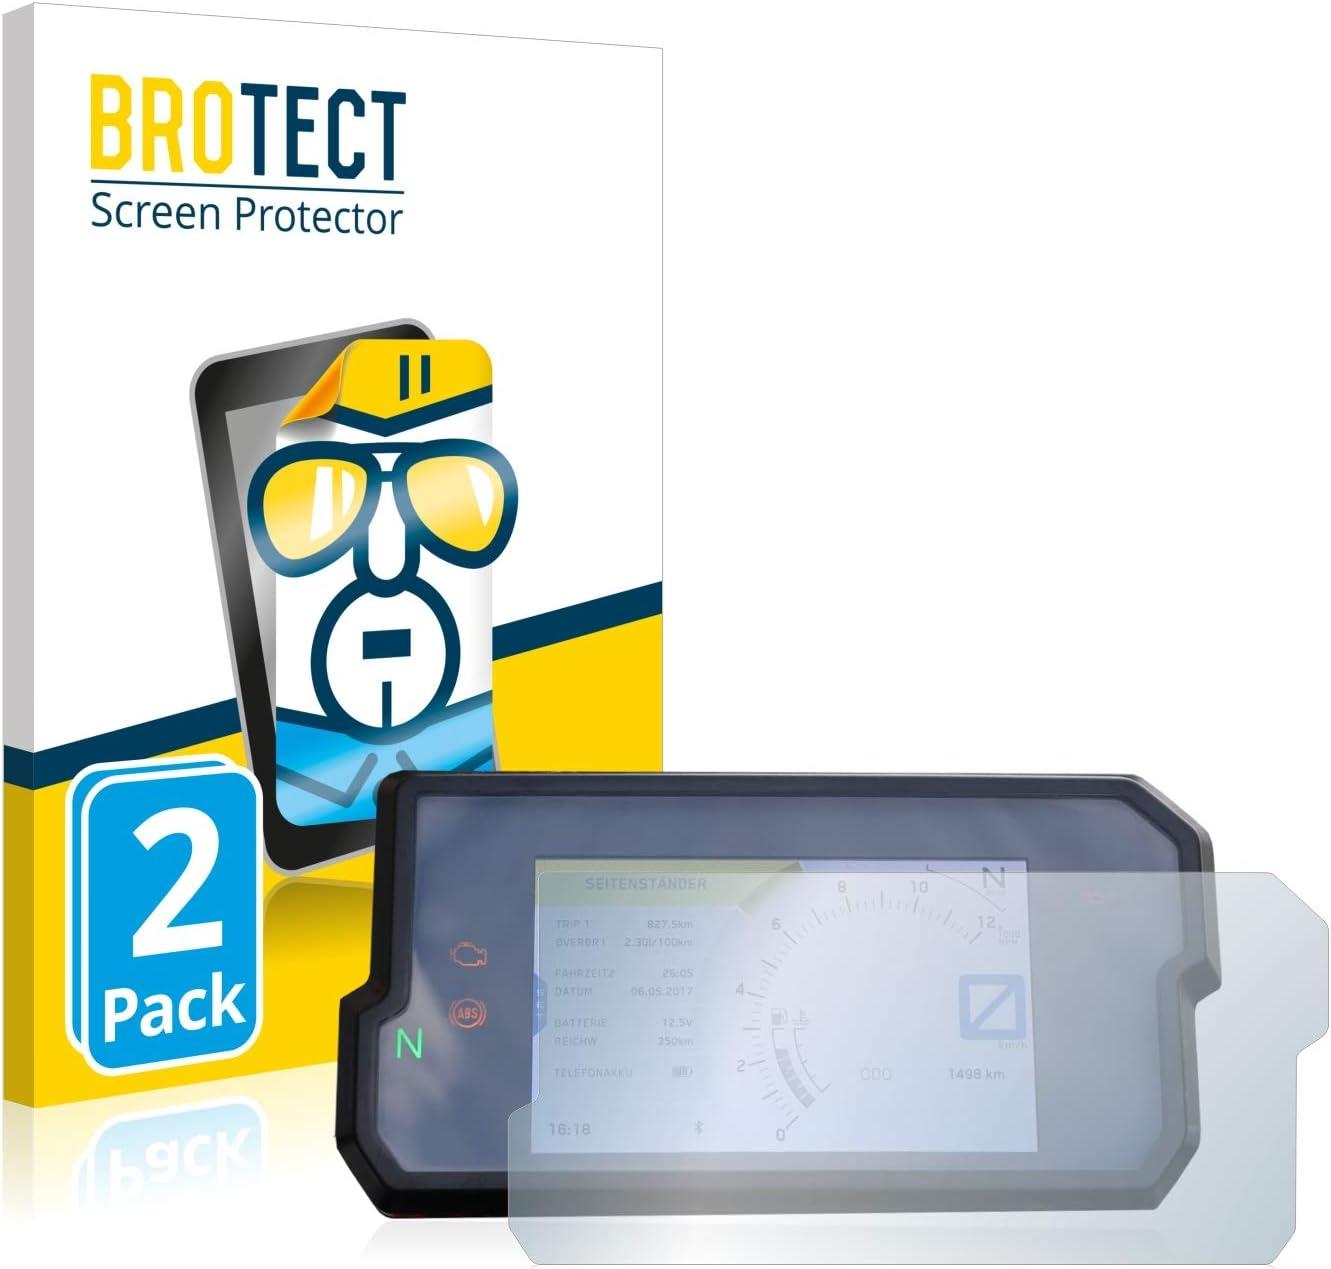 Brotect Schutzfolie Kompatibel Mit Ktm 125 Duke 2019 Elektronik